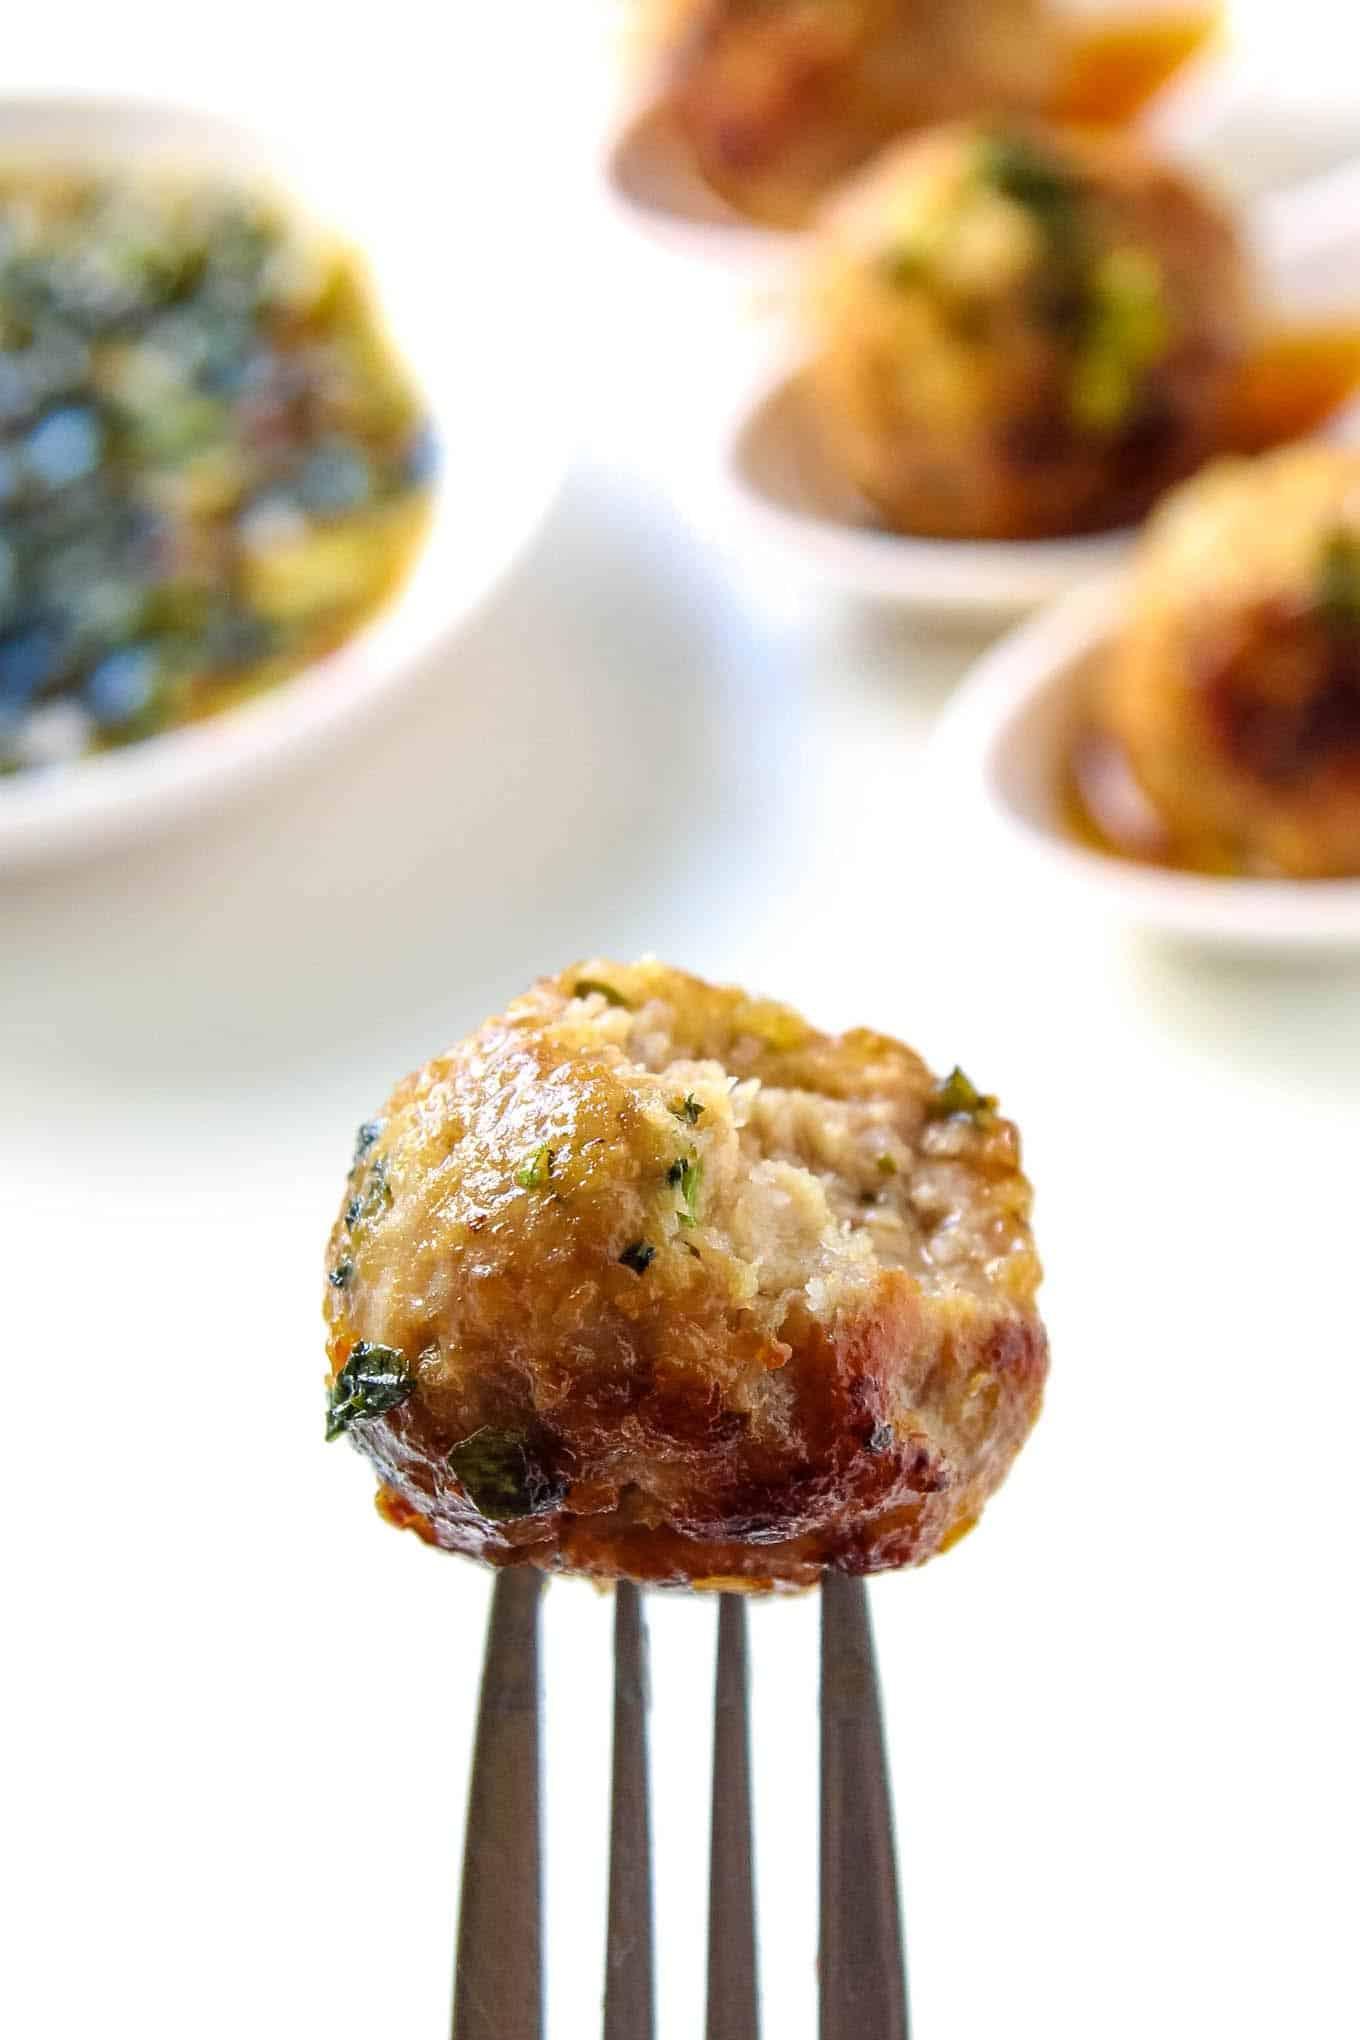 Thai Pork Meatball on Fork